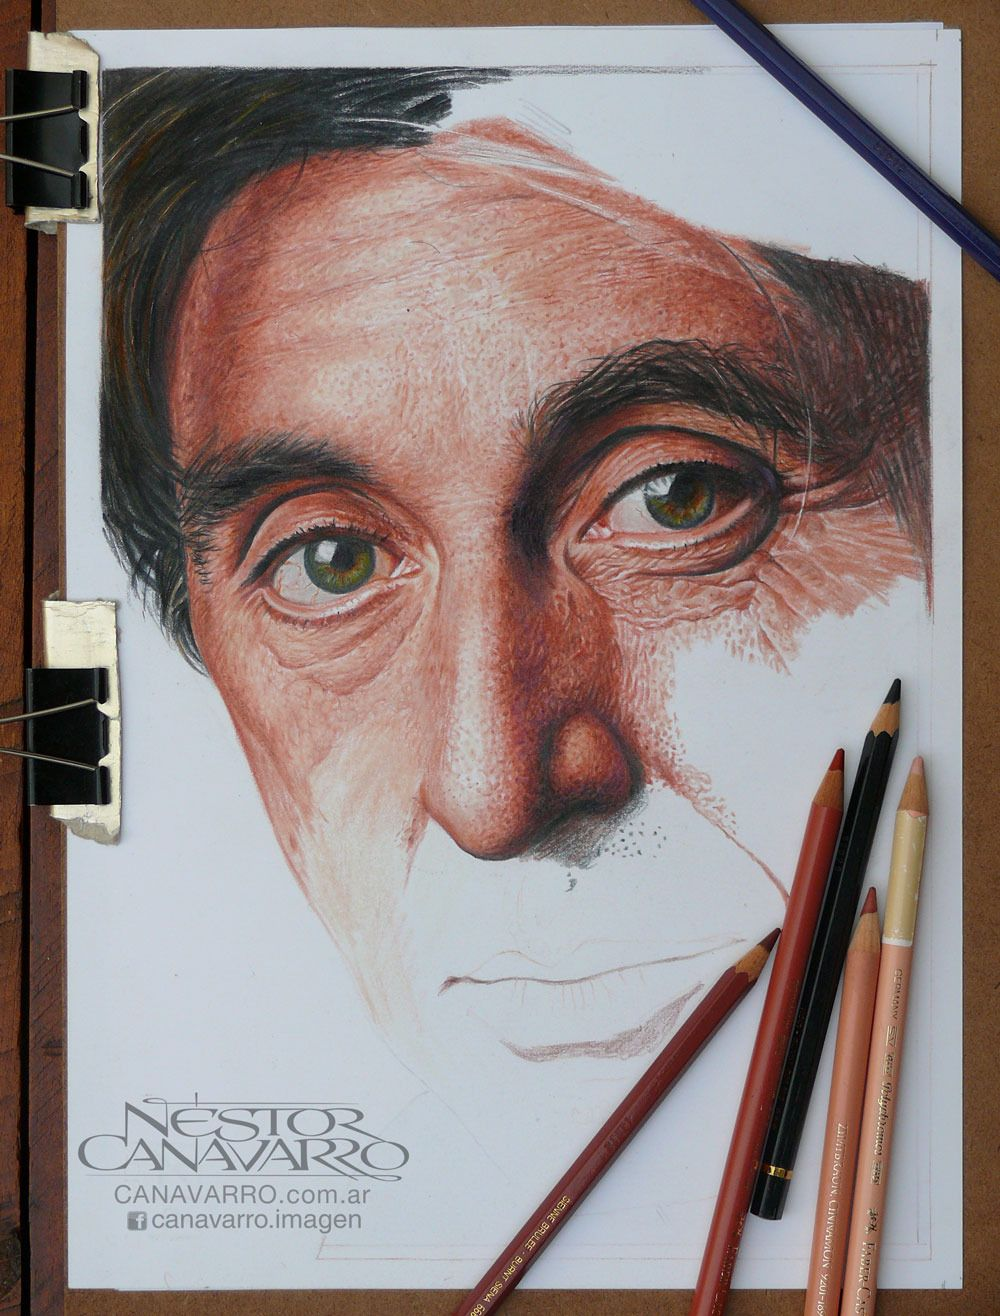 Nestor Cannavaro Google Search DrawPaint Color Pinterest - Amazing hyper realistic pencil drawings celebrities nestor canavarro